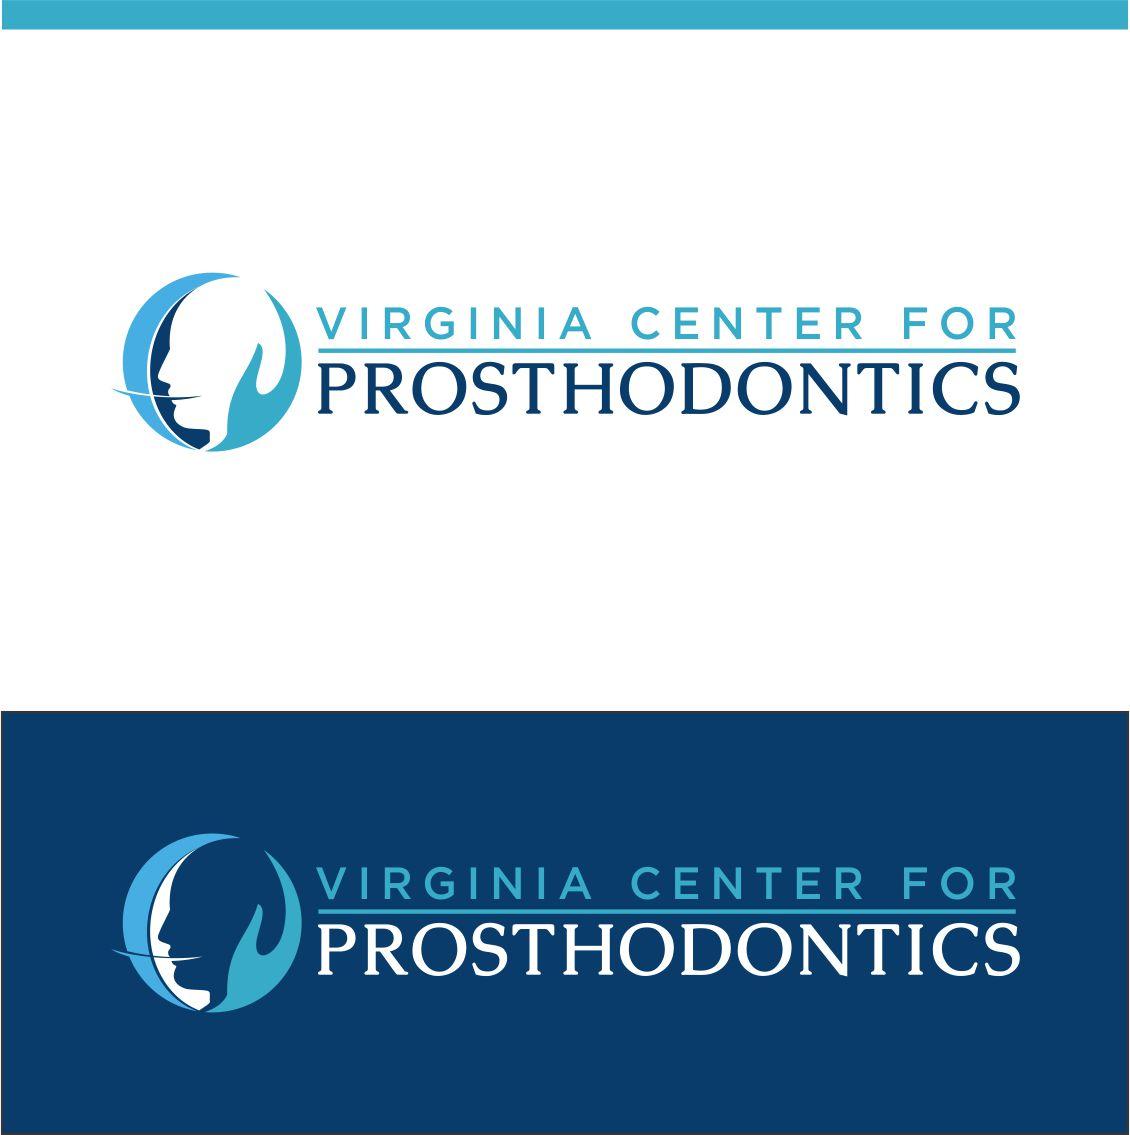 Logo Design by RasYa Muhammad Athaya - Entry No. 105 in the Logo Design Contest Imaginative Logo Design for Virginia Center for Prosthodontics.